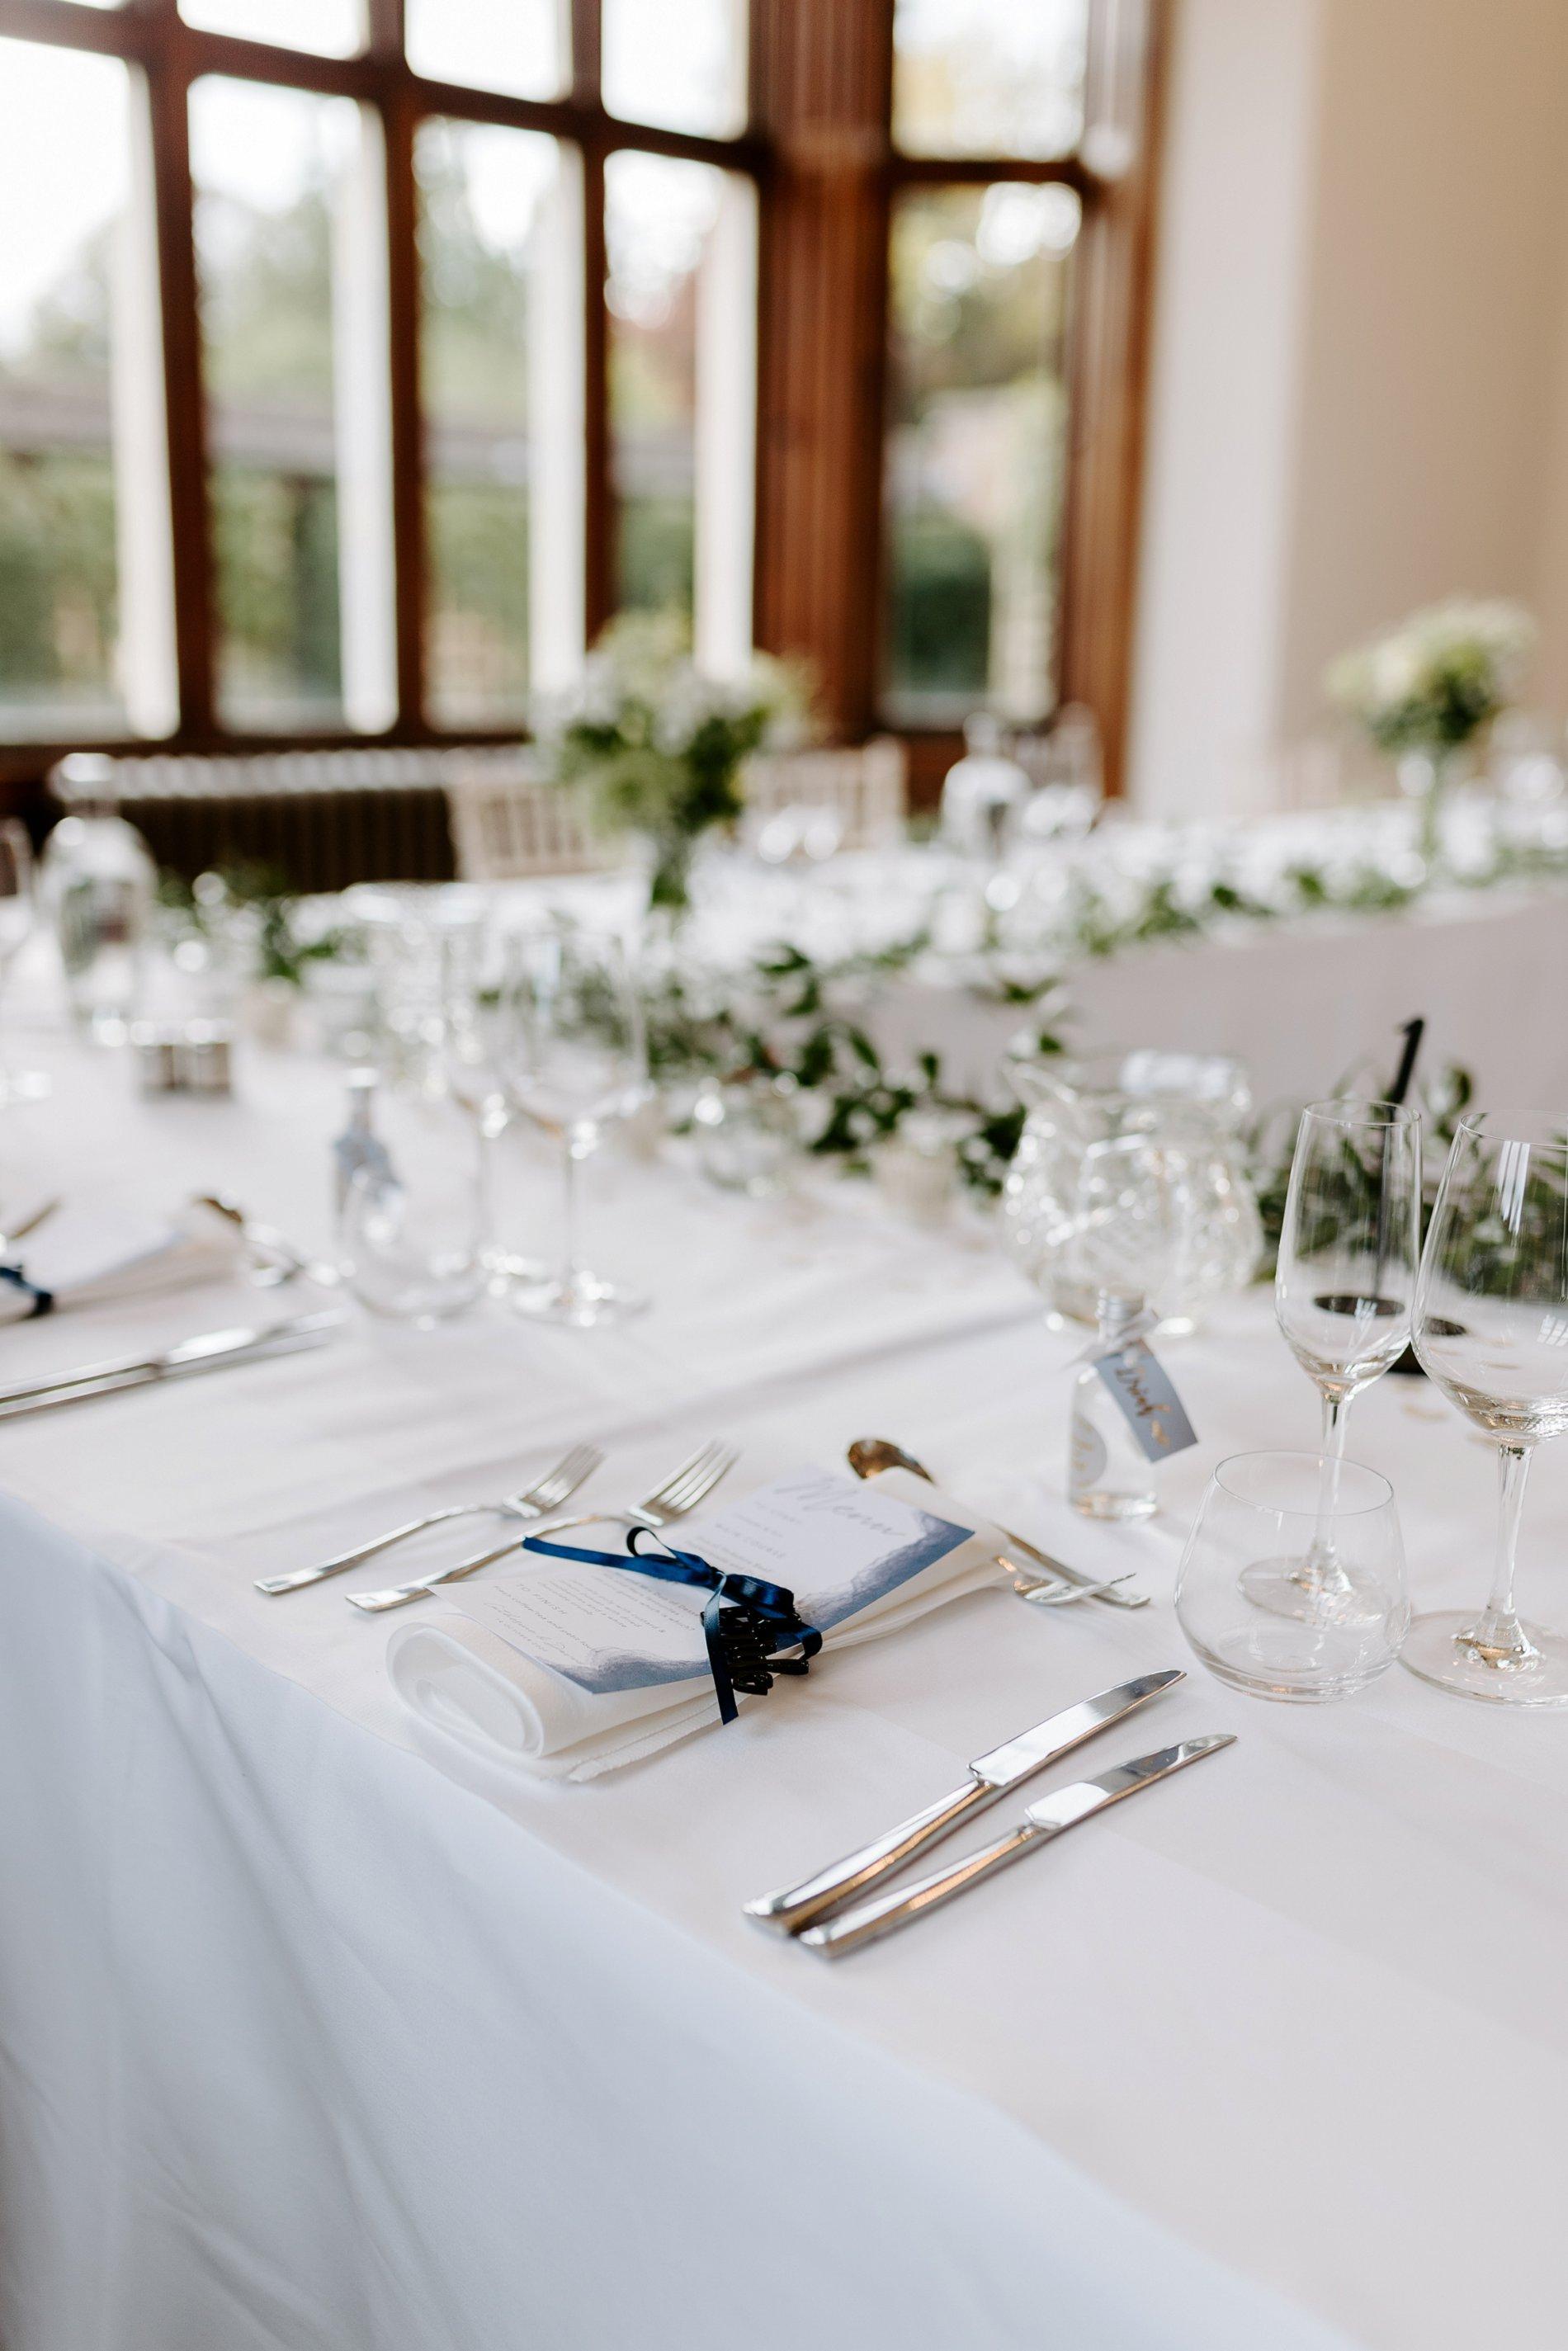 An Elegant White Wedding at Thicket Priory (c) Carla Whittingham Photography (52)